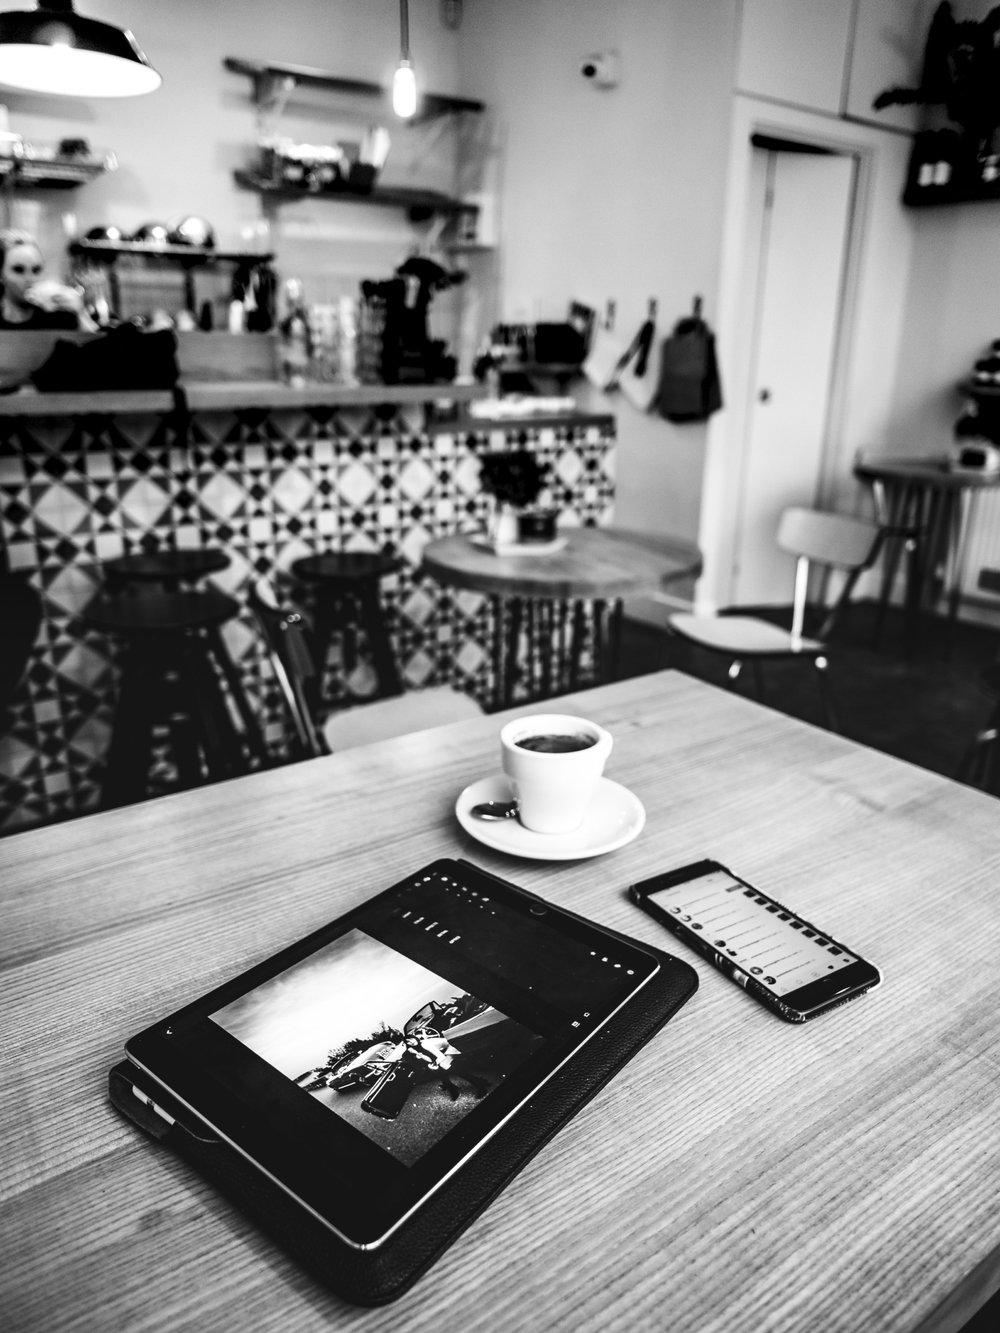 iPad Adobe Lightroom Creative Cloud iPhone Mae and Harvey Roman Road East London Coffee Shop Cafe Zara Martin Monaco Monte Carlo Editing Apple Pencil